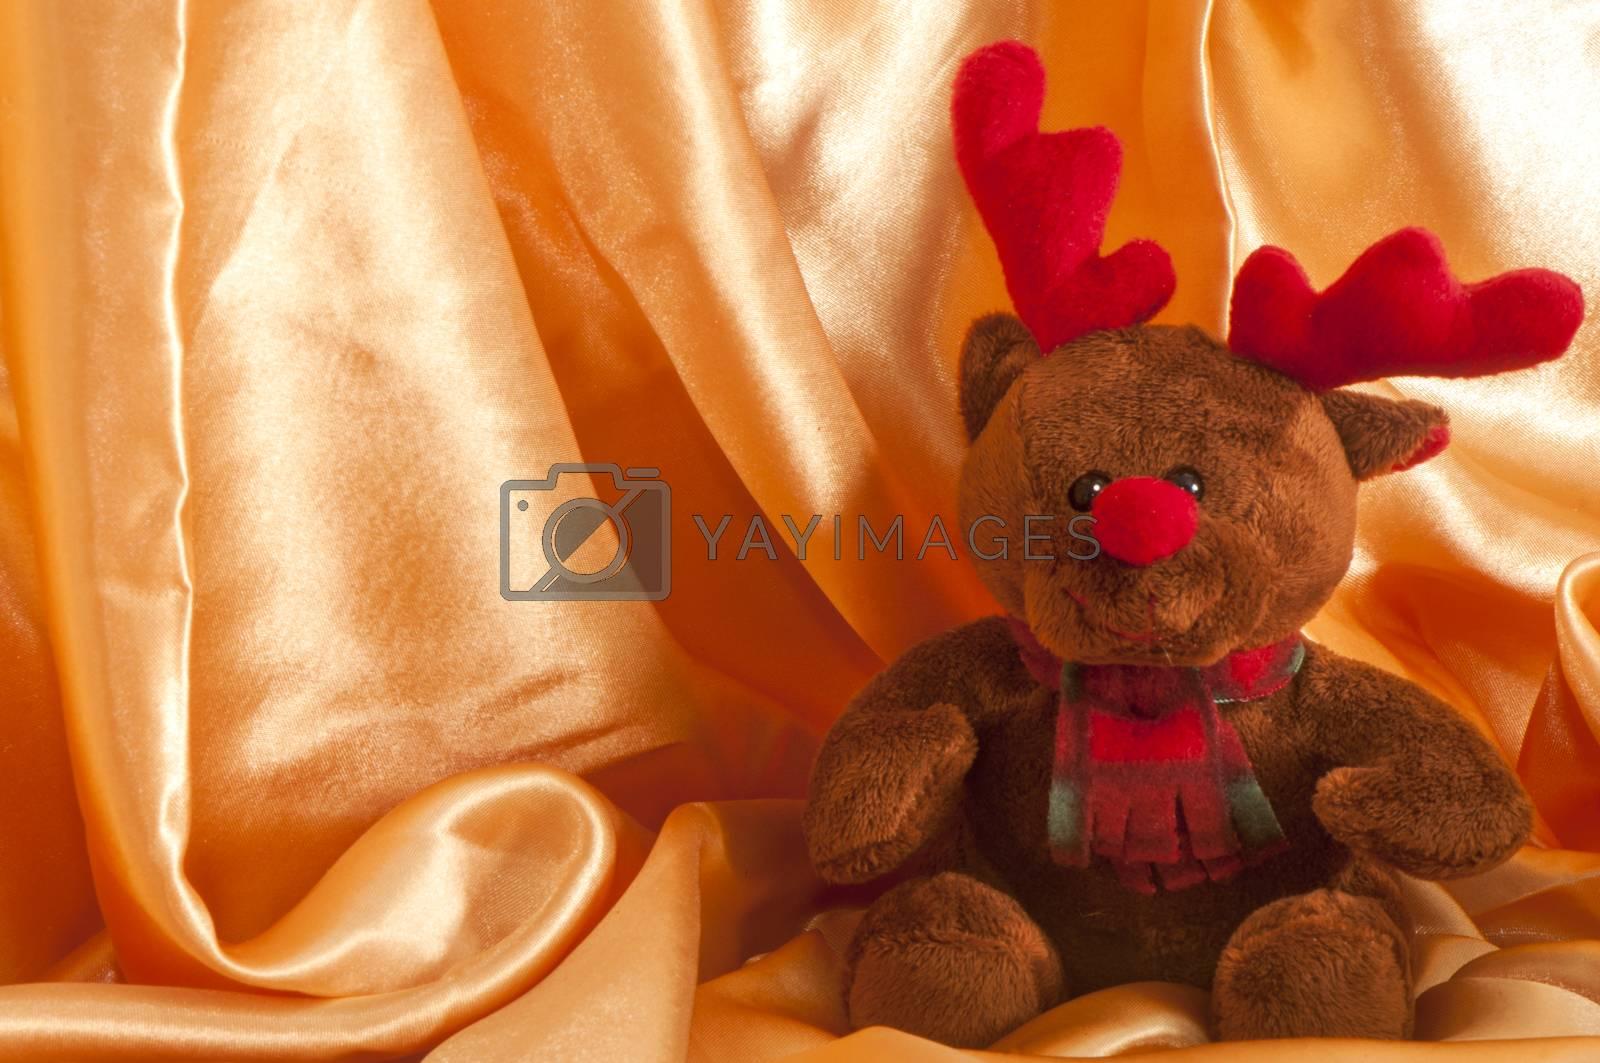 Royalty free image of a anumal plush by carla720